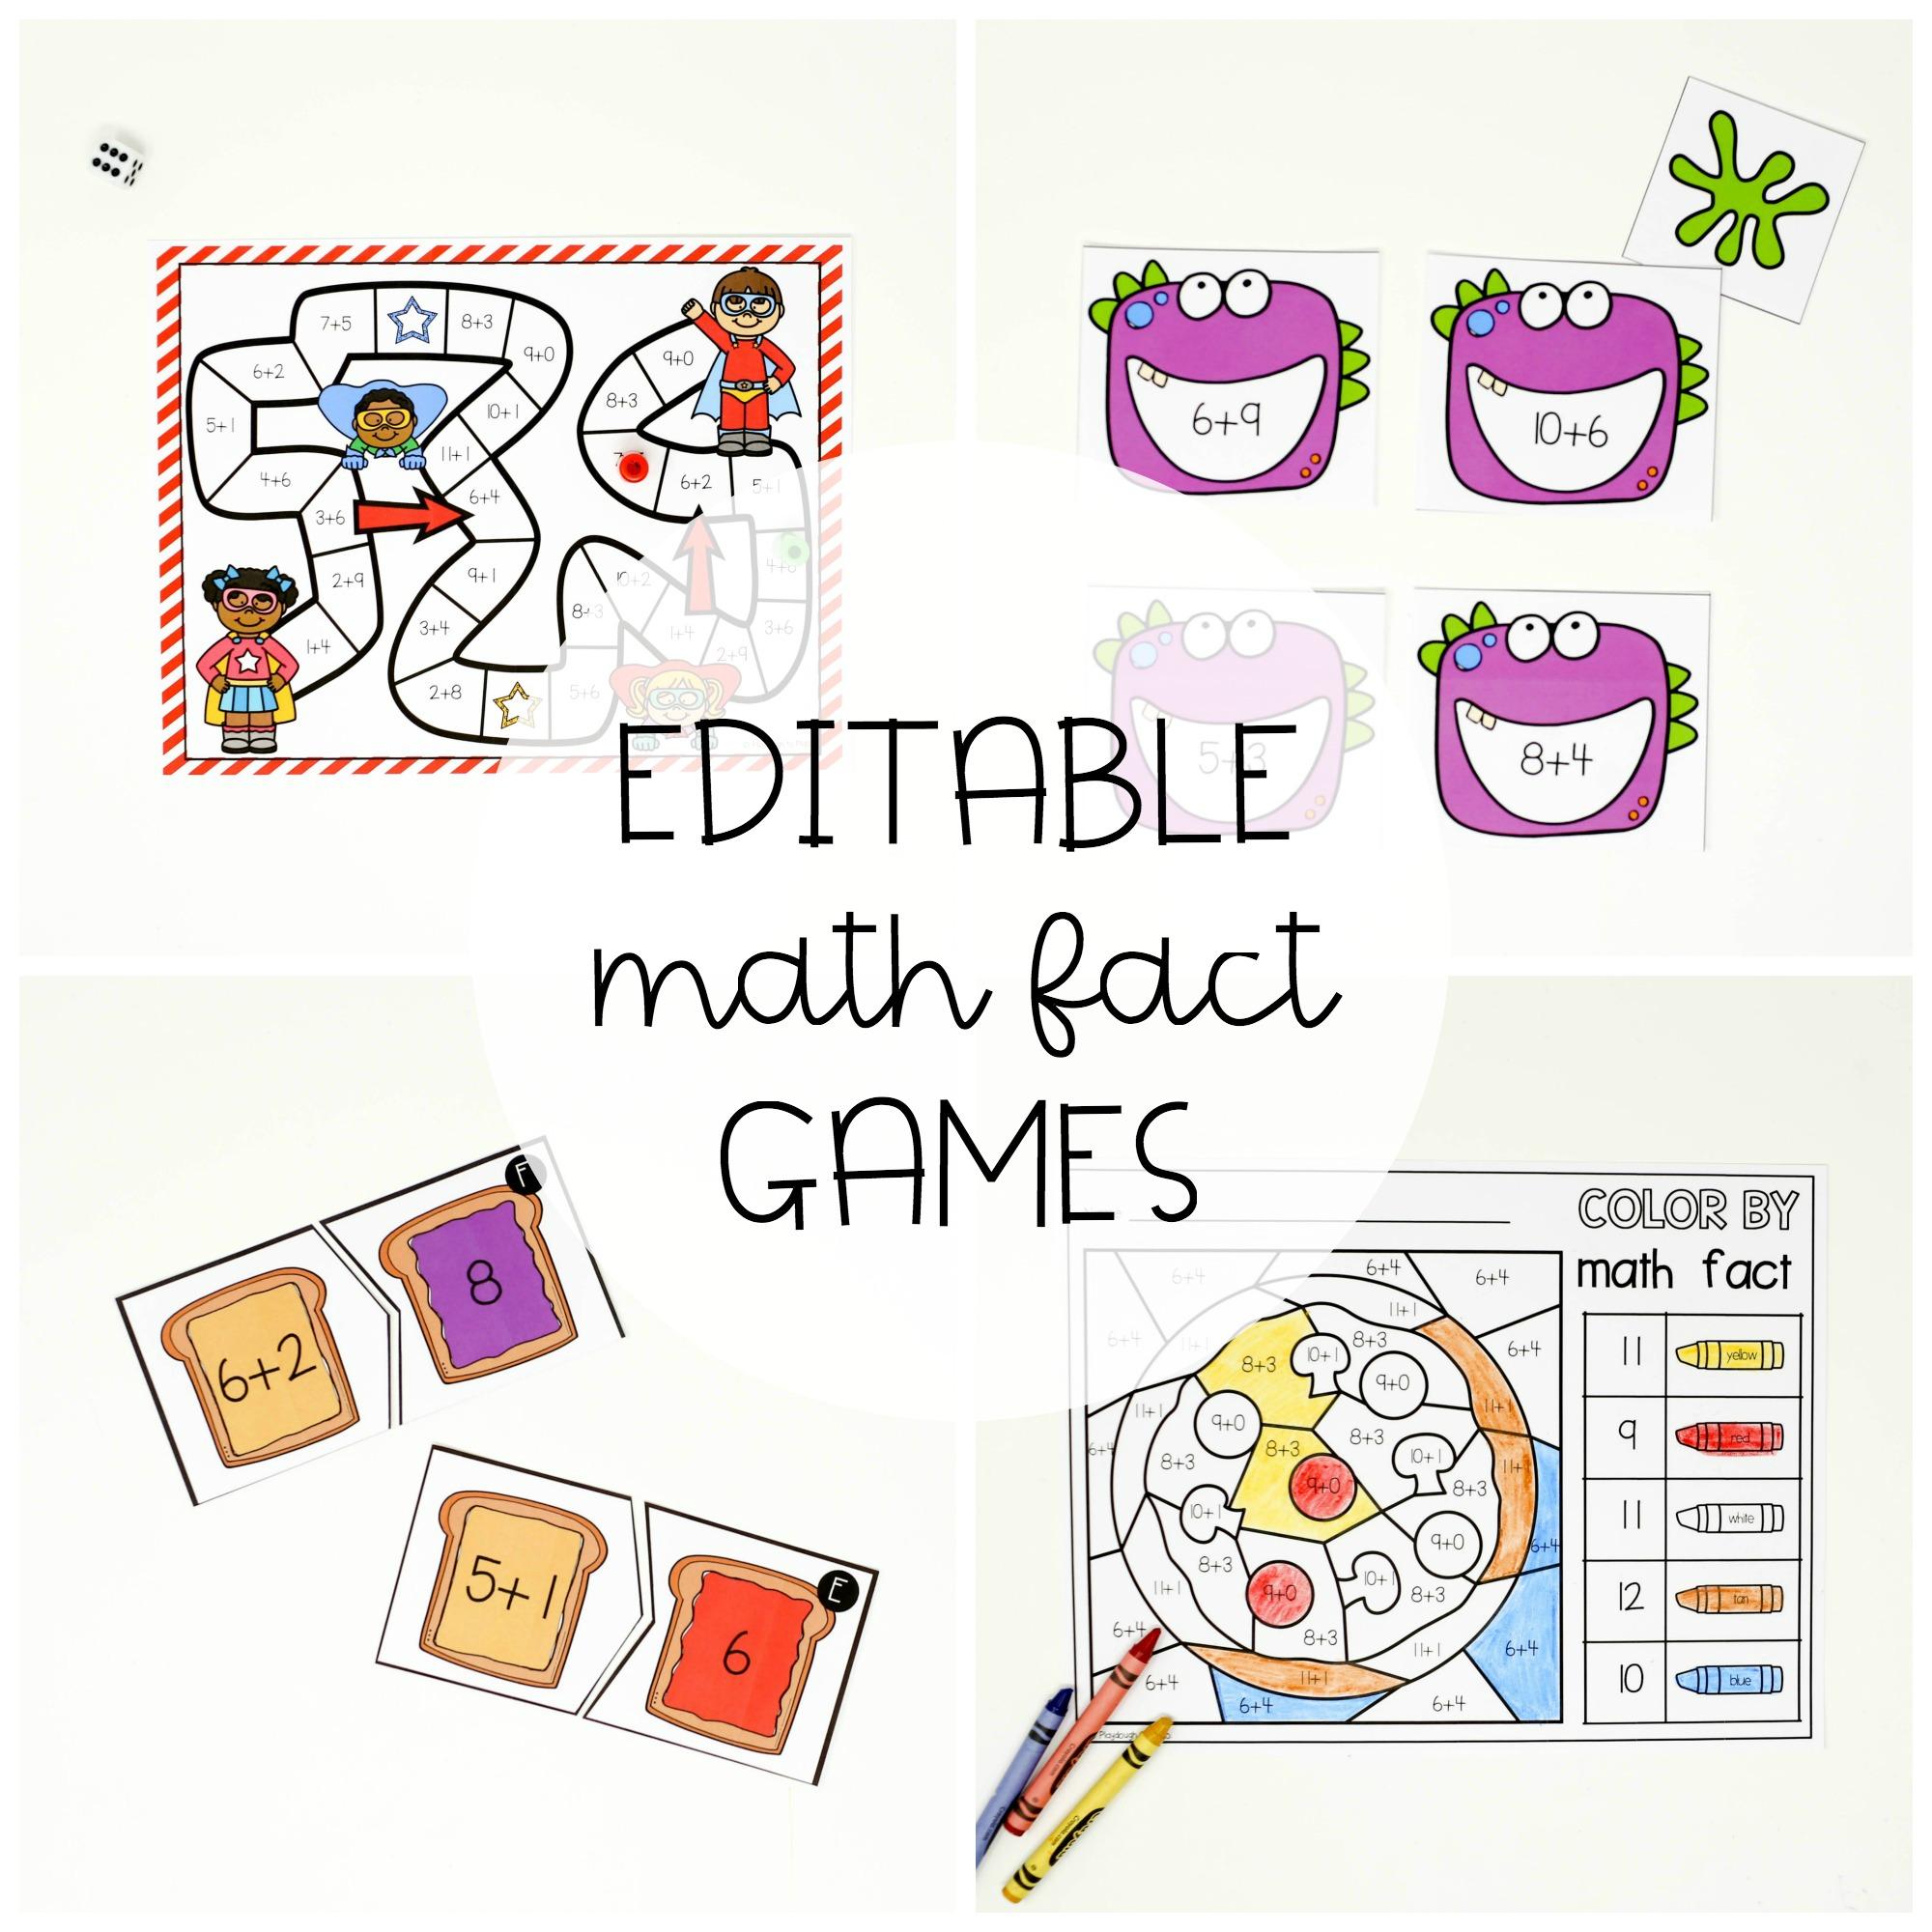 15 EDITABLE Math Fact Games